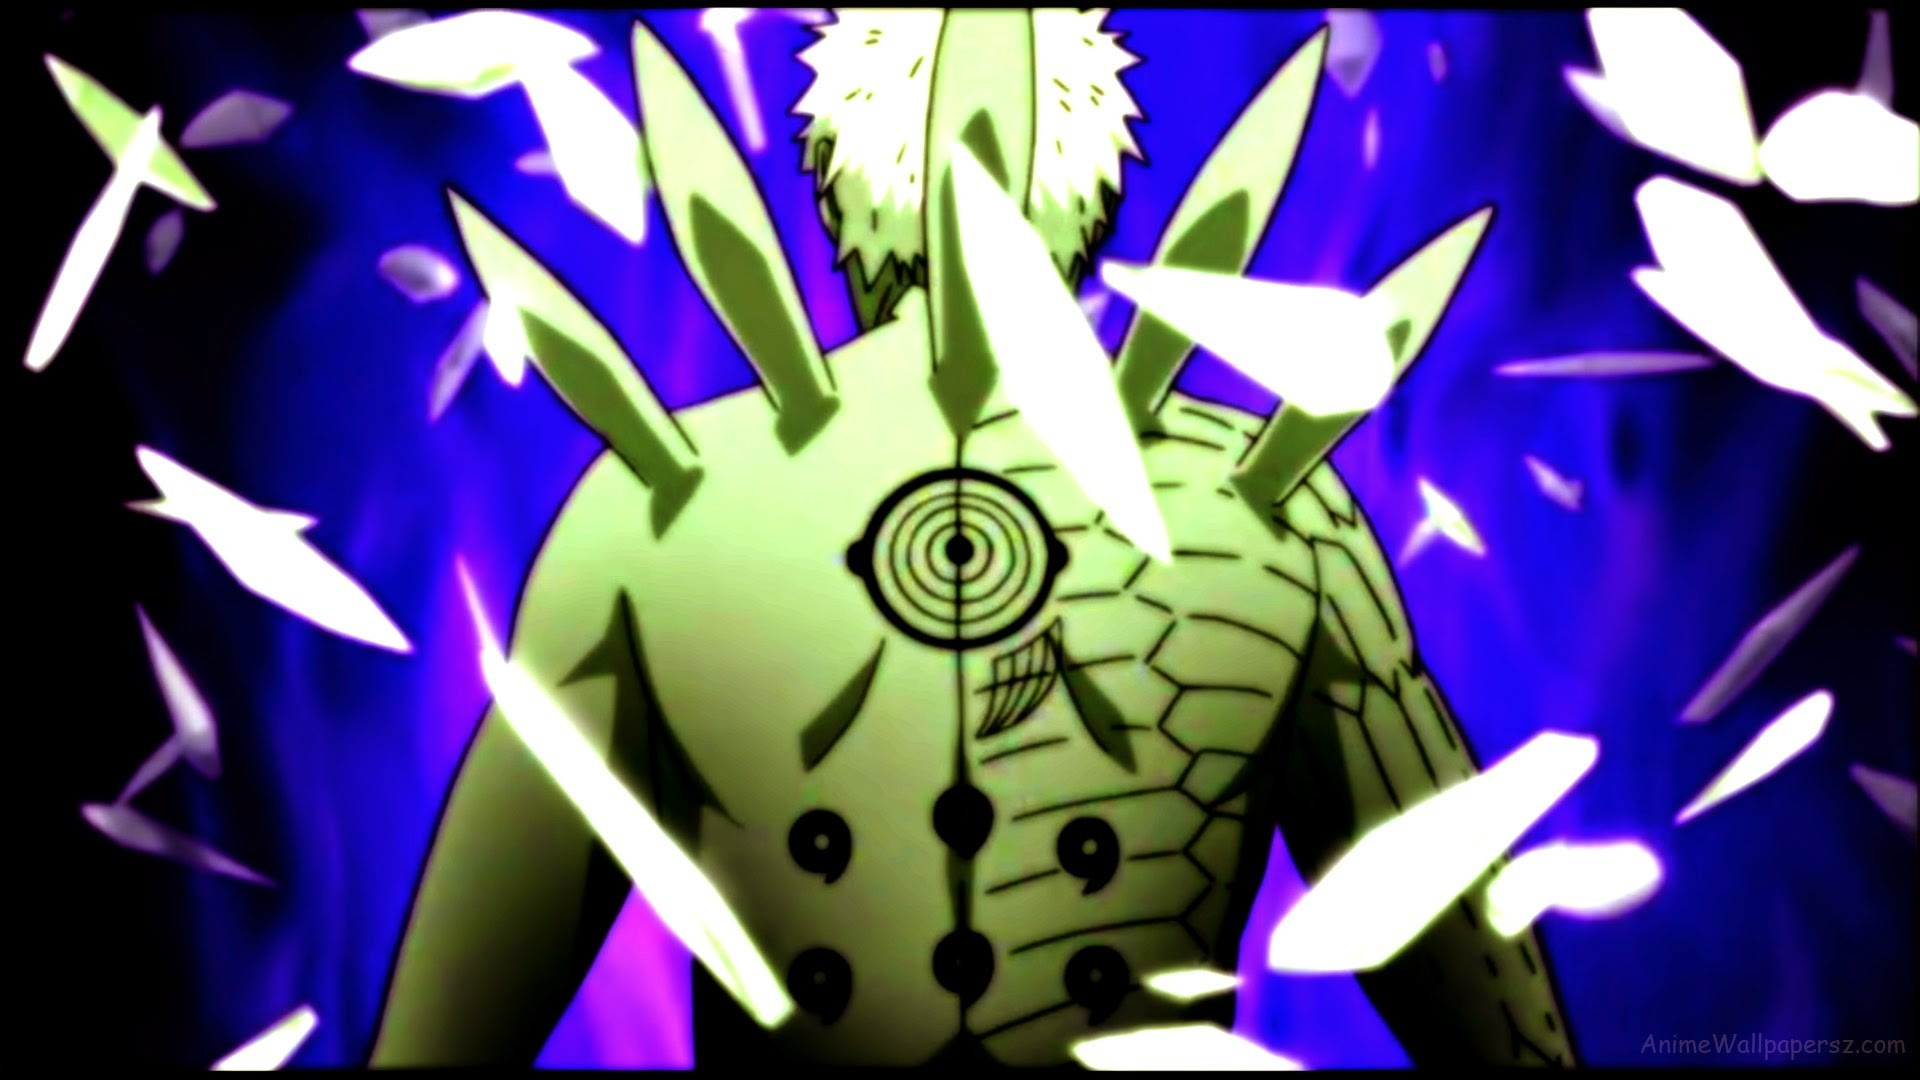 Obito Jinchuuriki Juubi Mode #anime <https://plus.google.com/s/%23anime> #n.